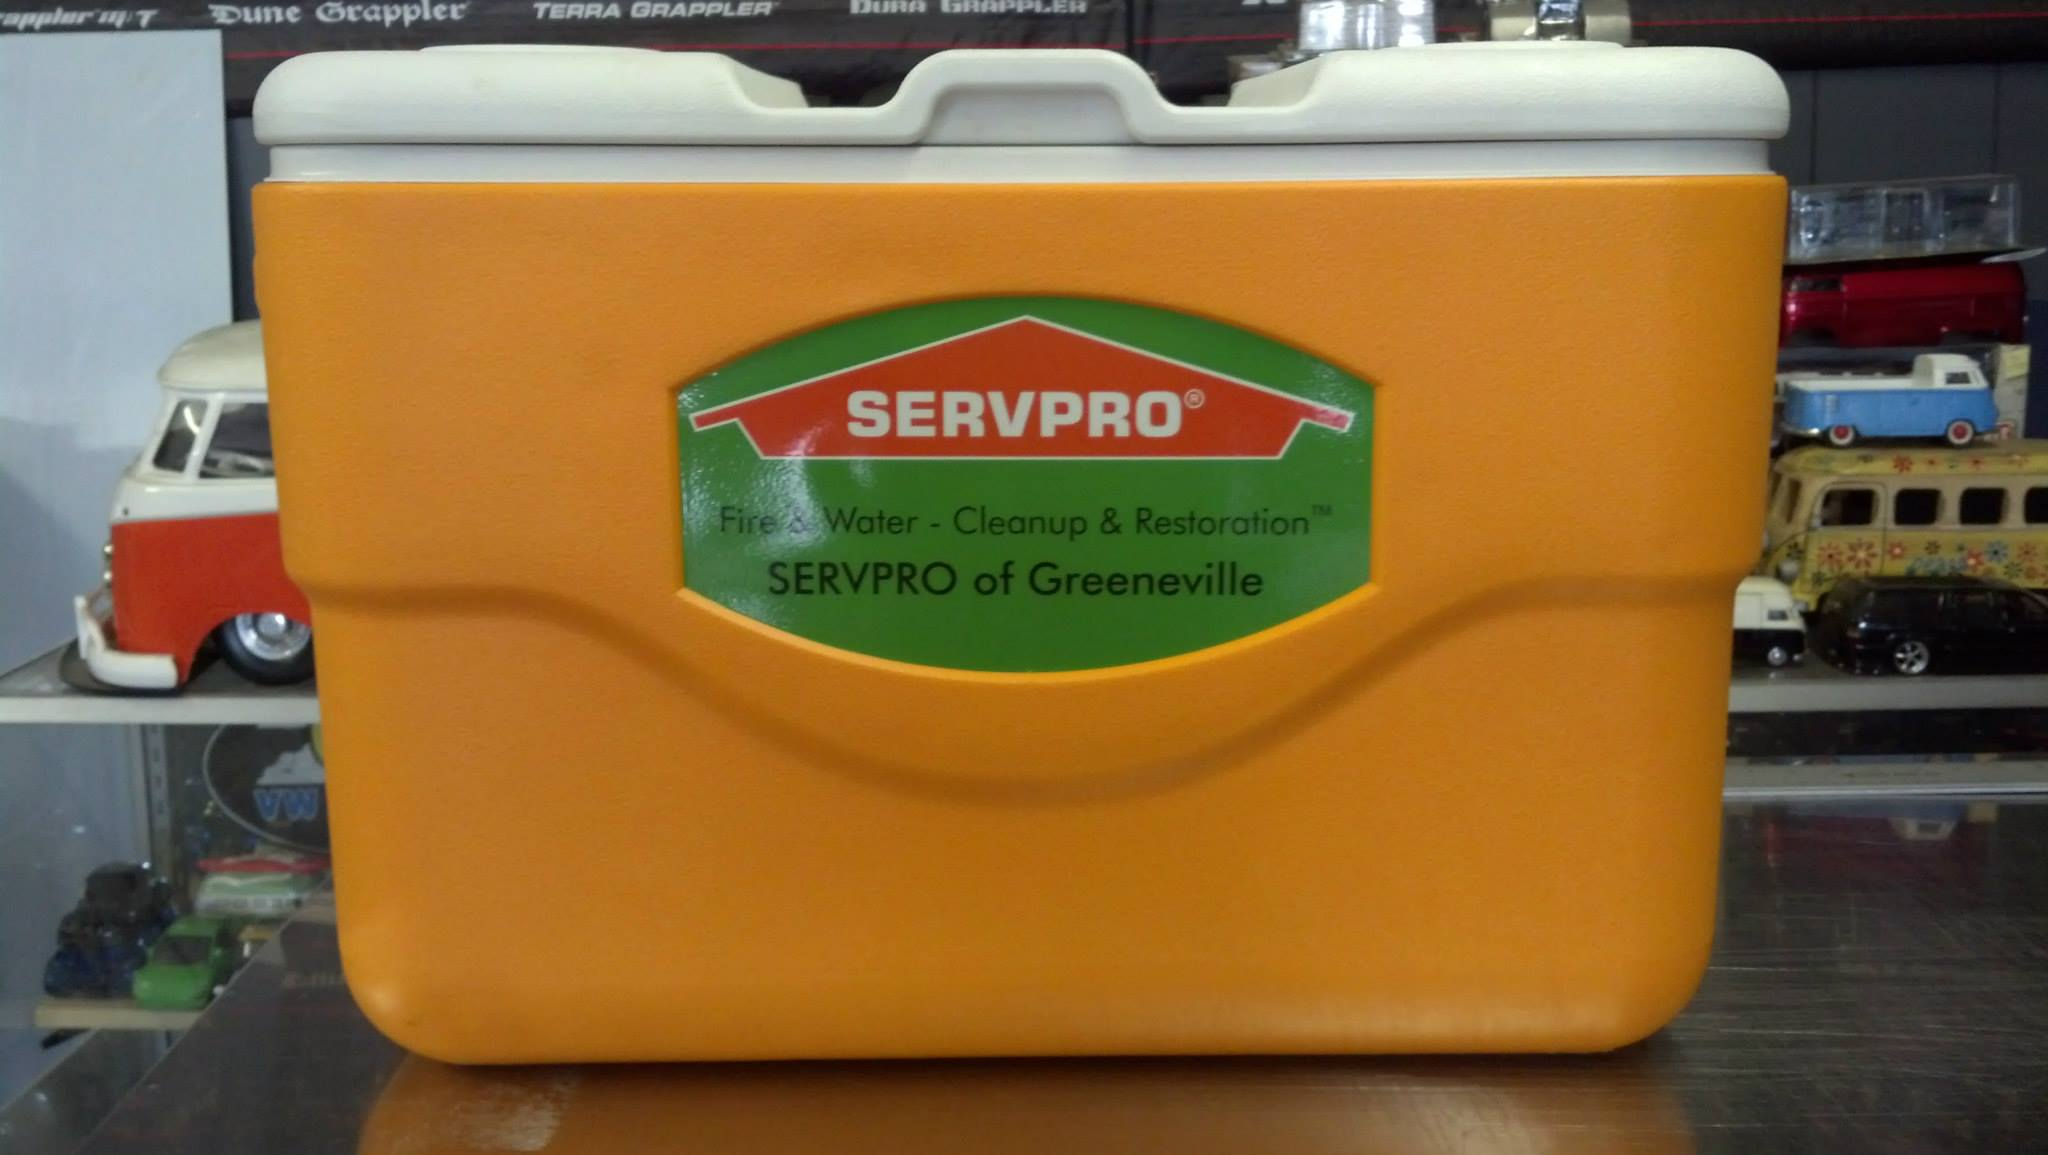 SERVPRO of Greeneville